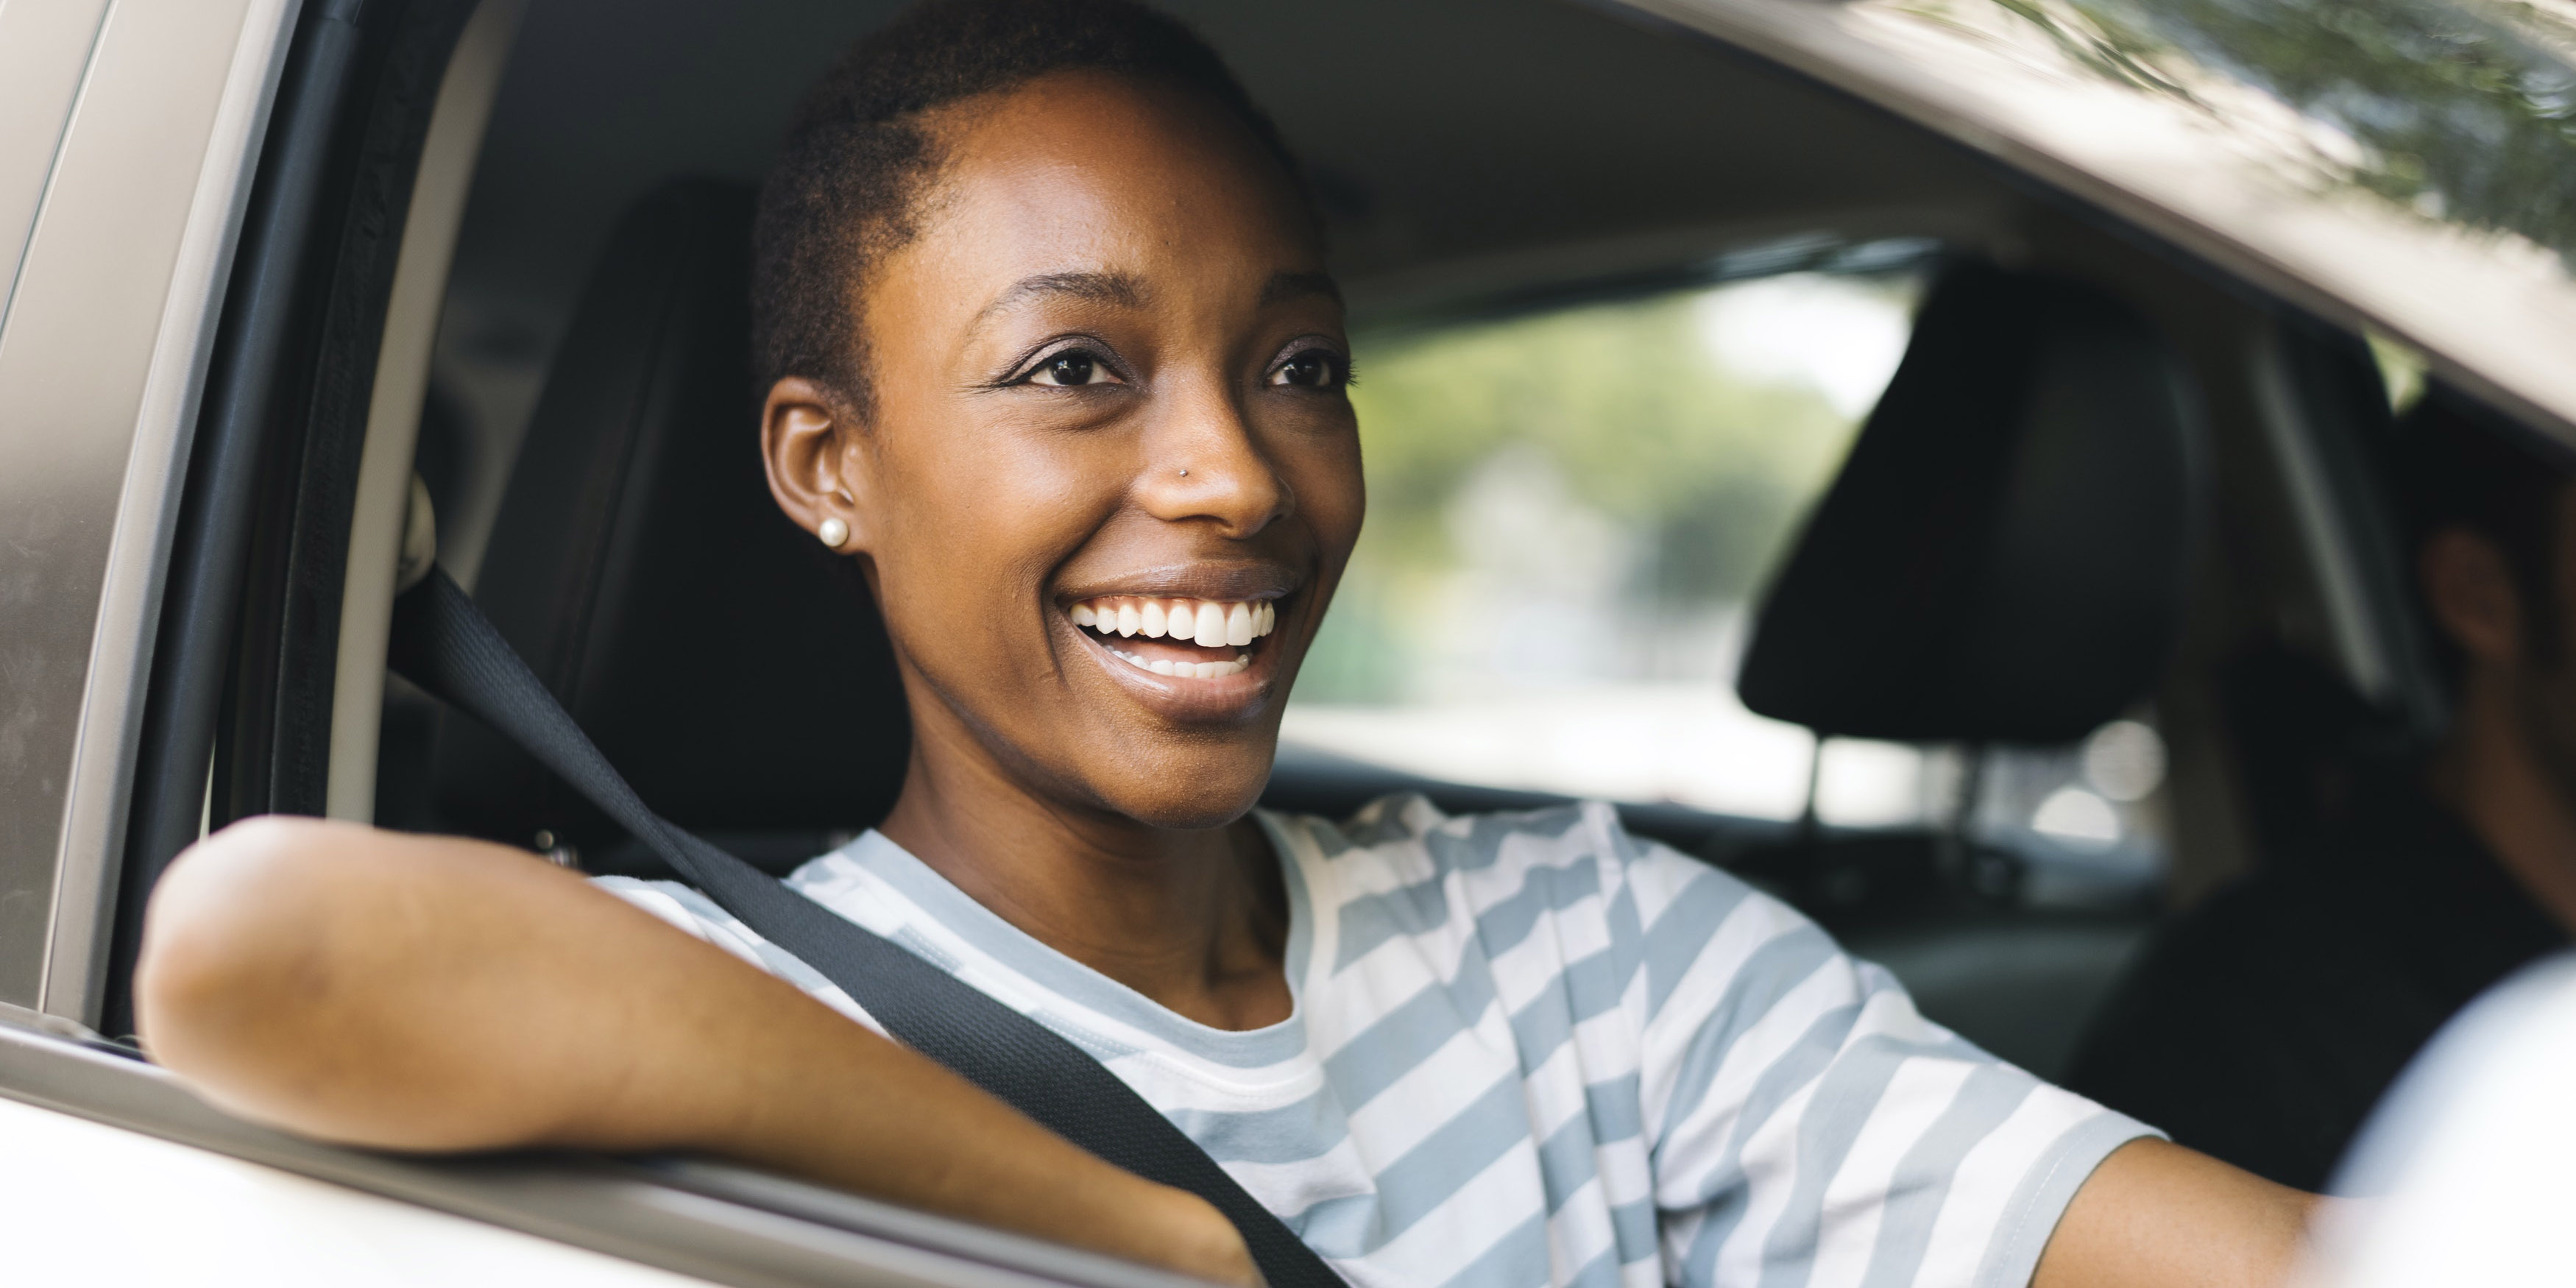 Driver Enjoying Fringe Benefits Tax (FBT) for Car